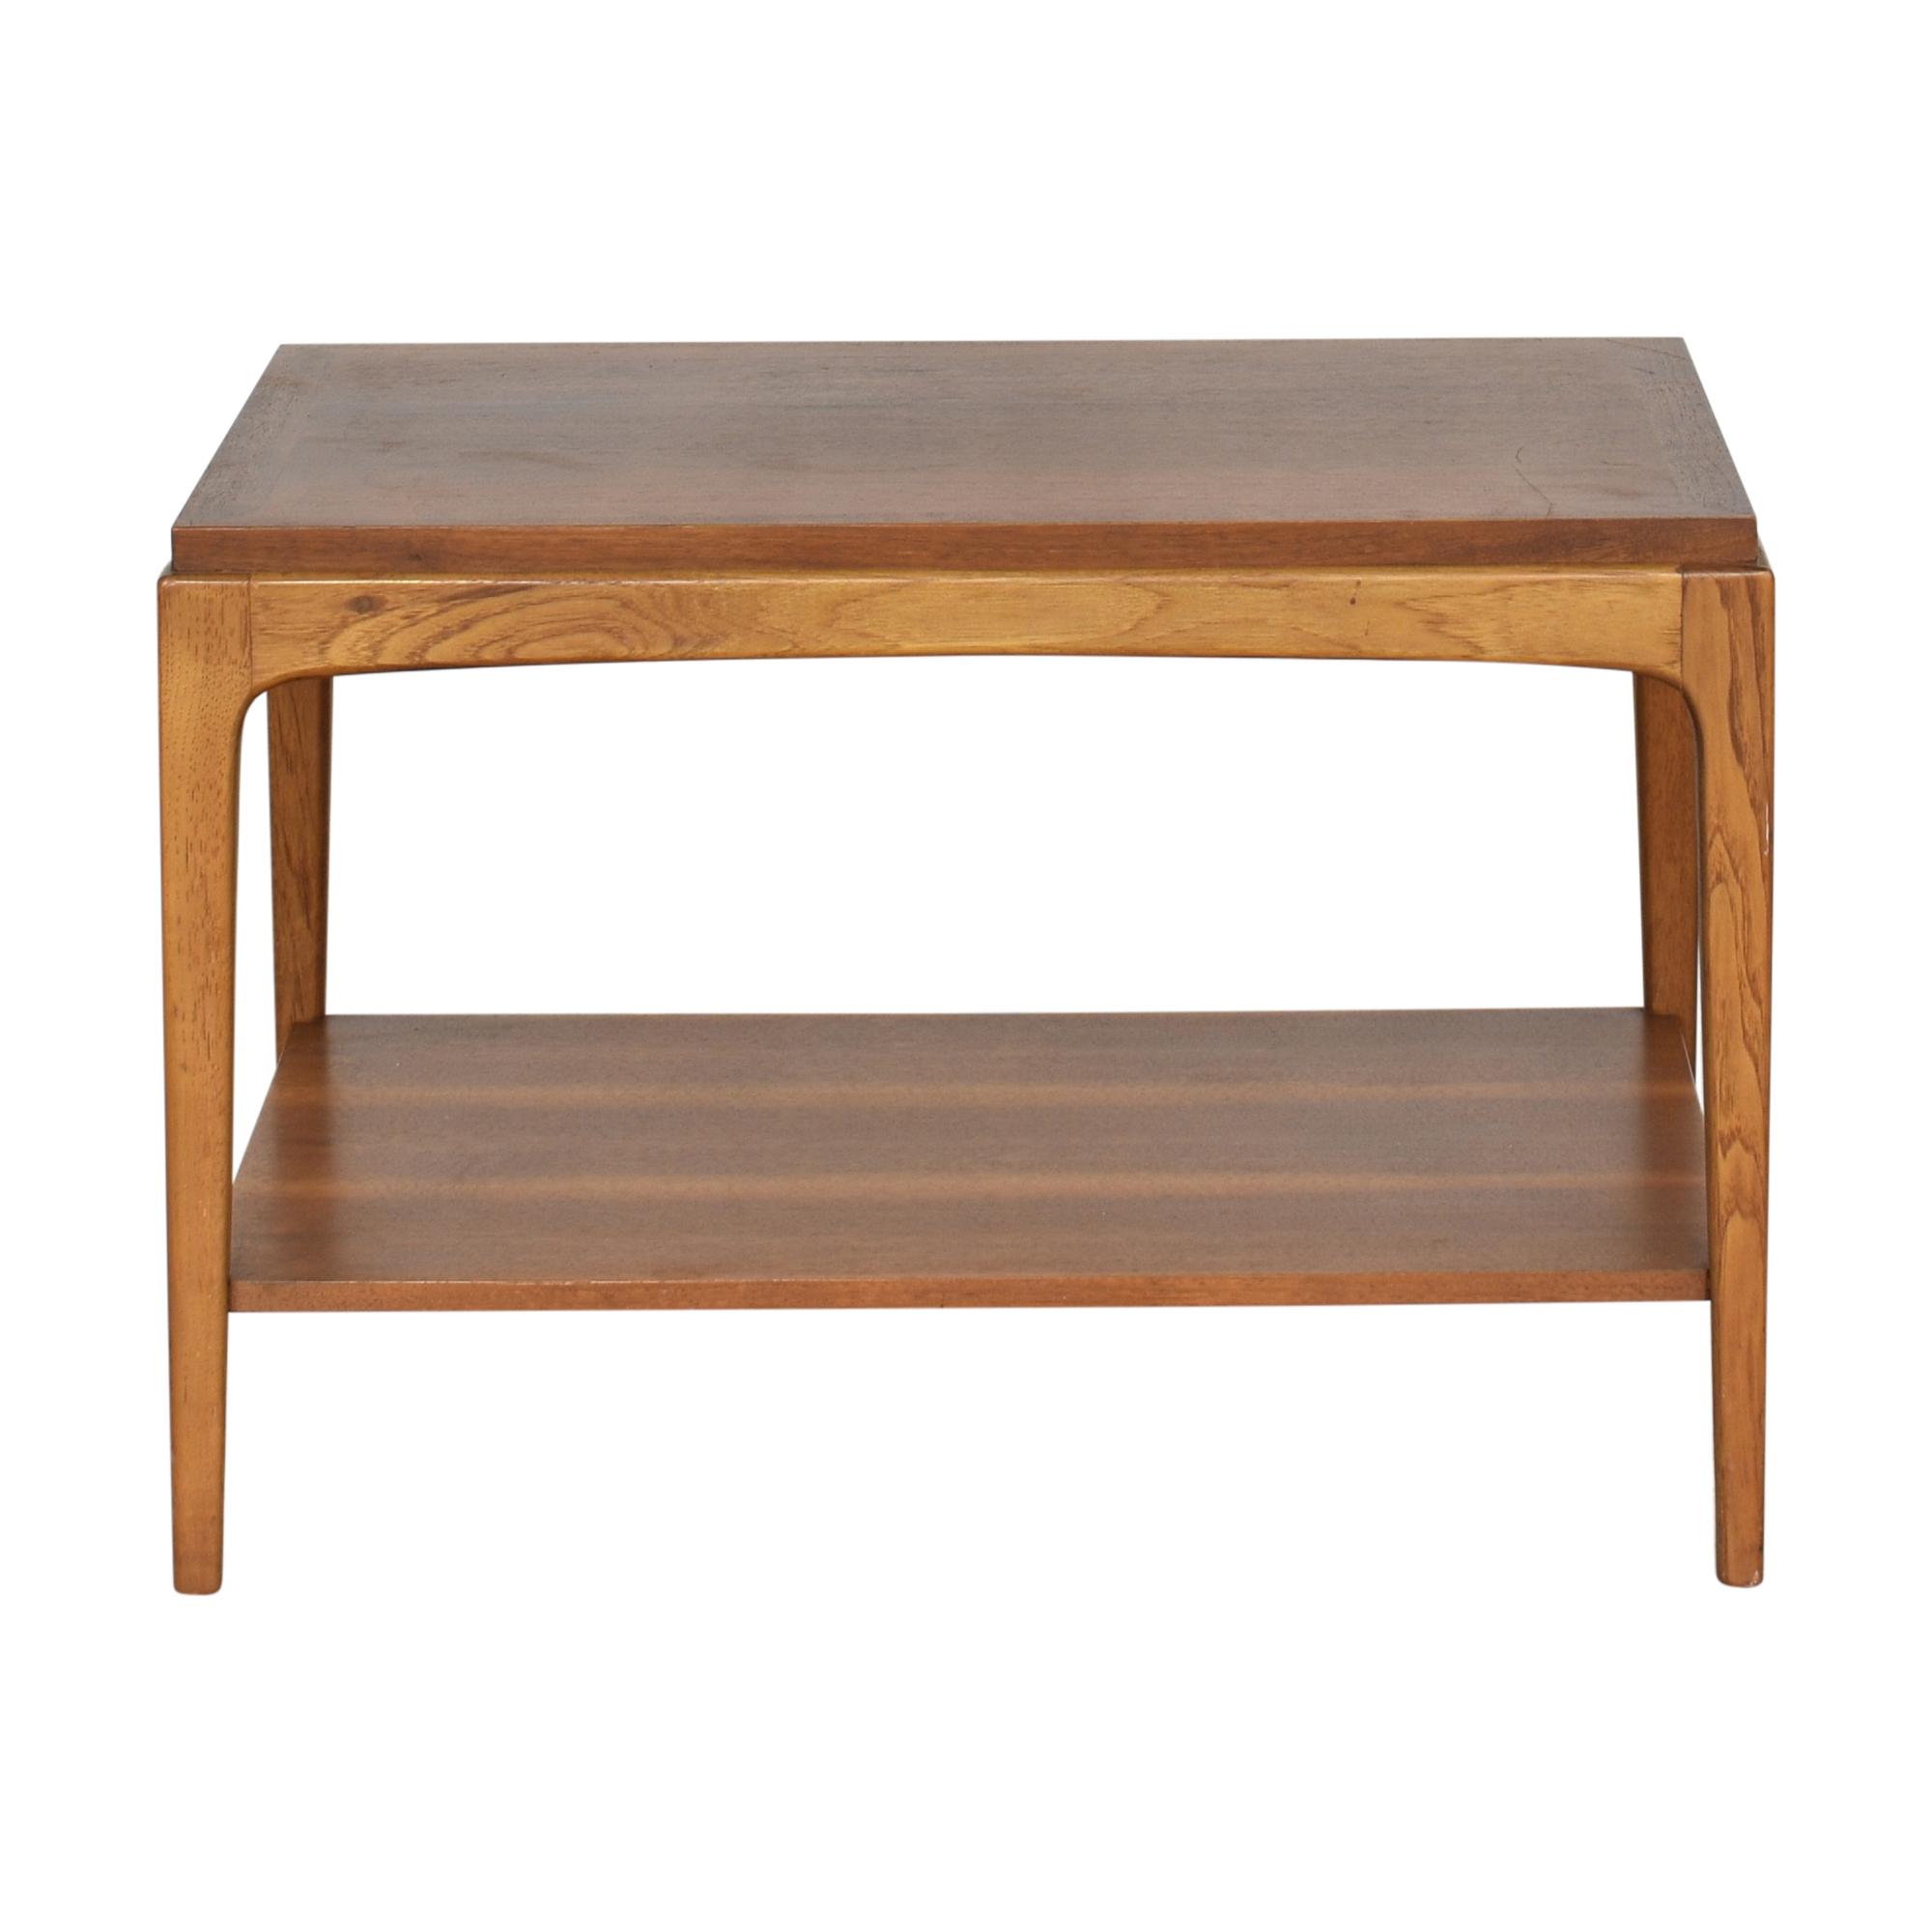 Lane Furniture Lane Furniture Modern Two Tier End Table on sale